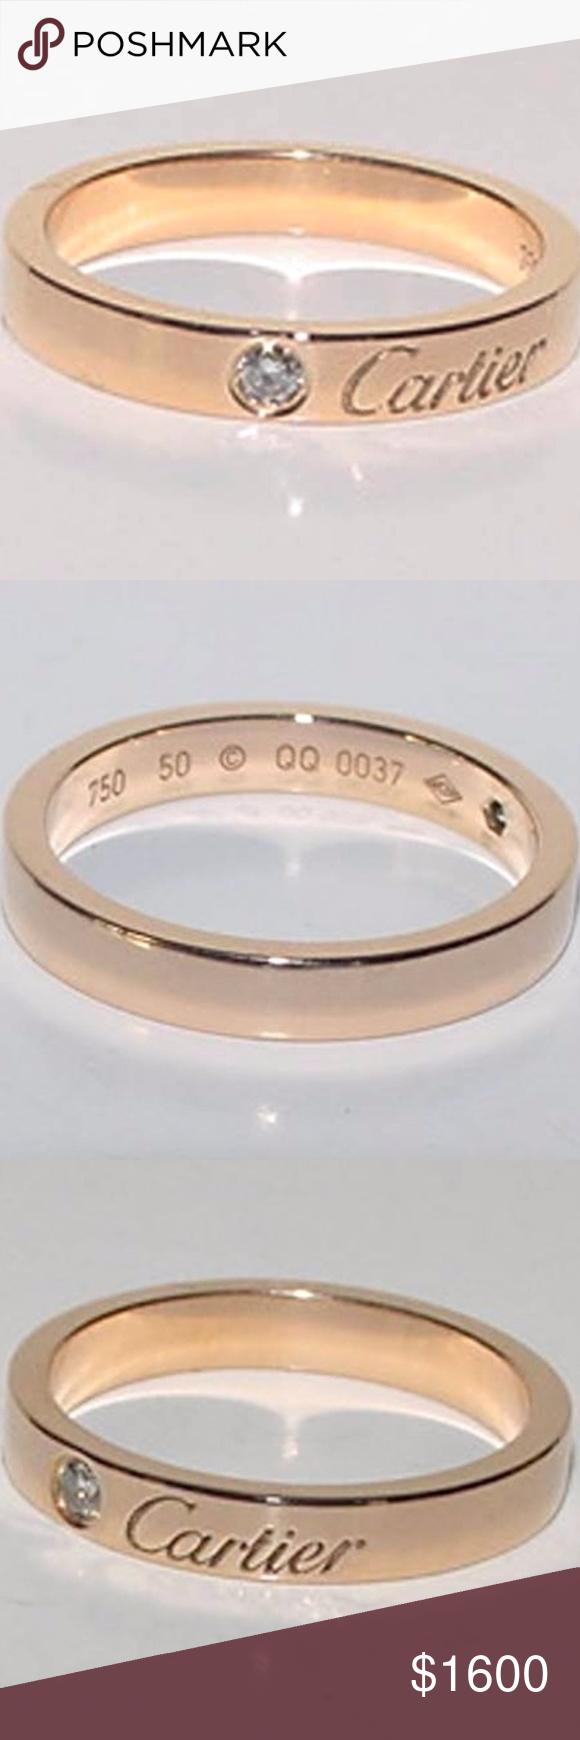 C De Cartier Wedding Band Pink Gold Diamond Up For